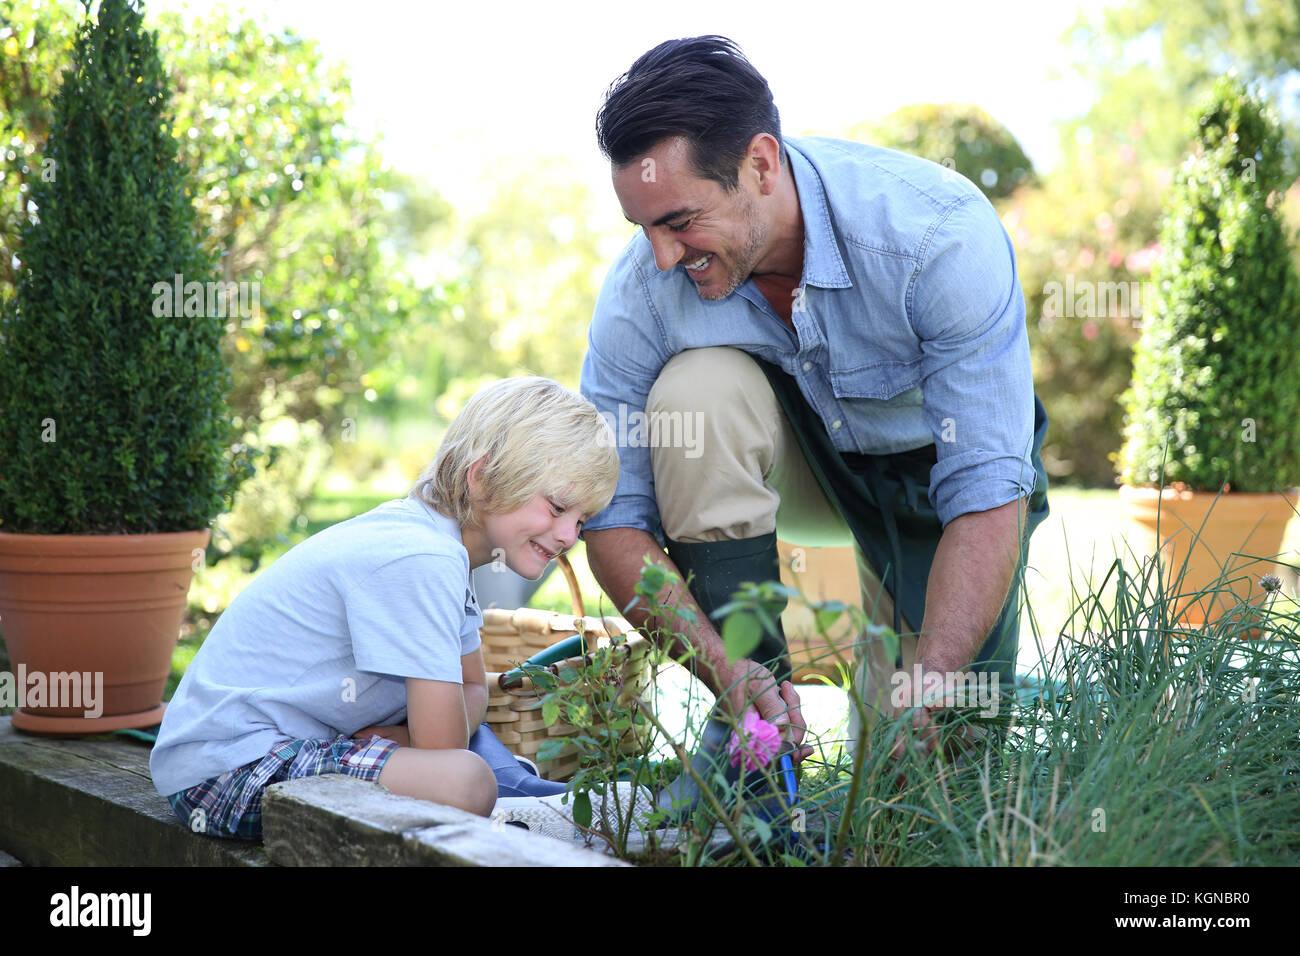 Little boy having fun with daddy gardening - Stock Image